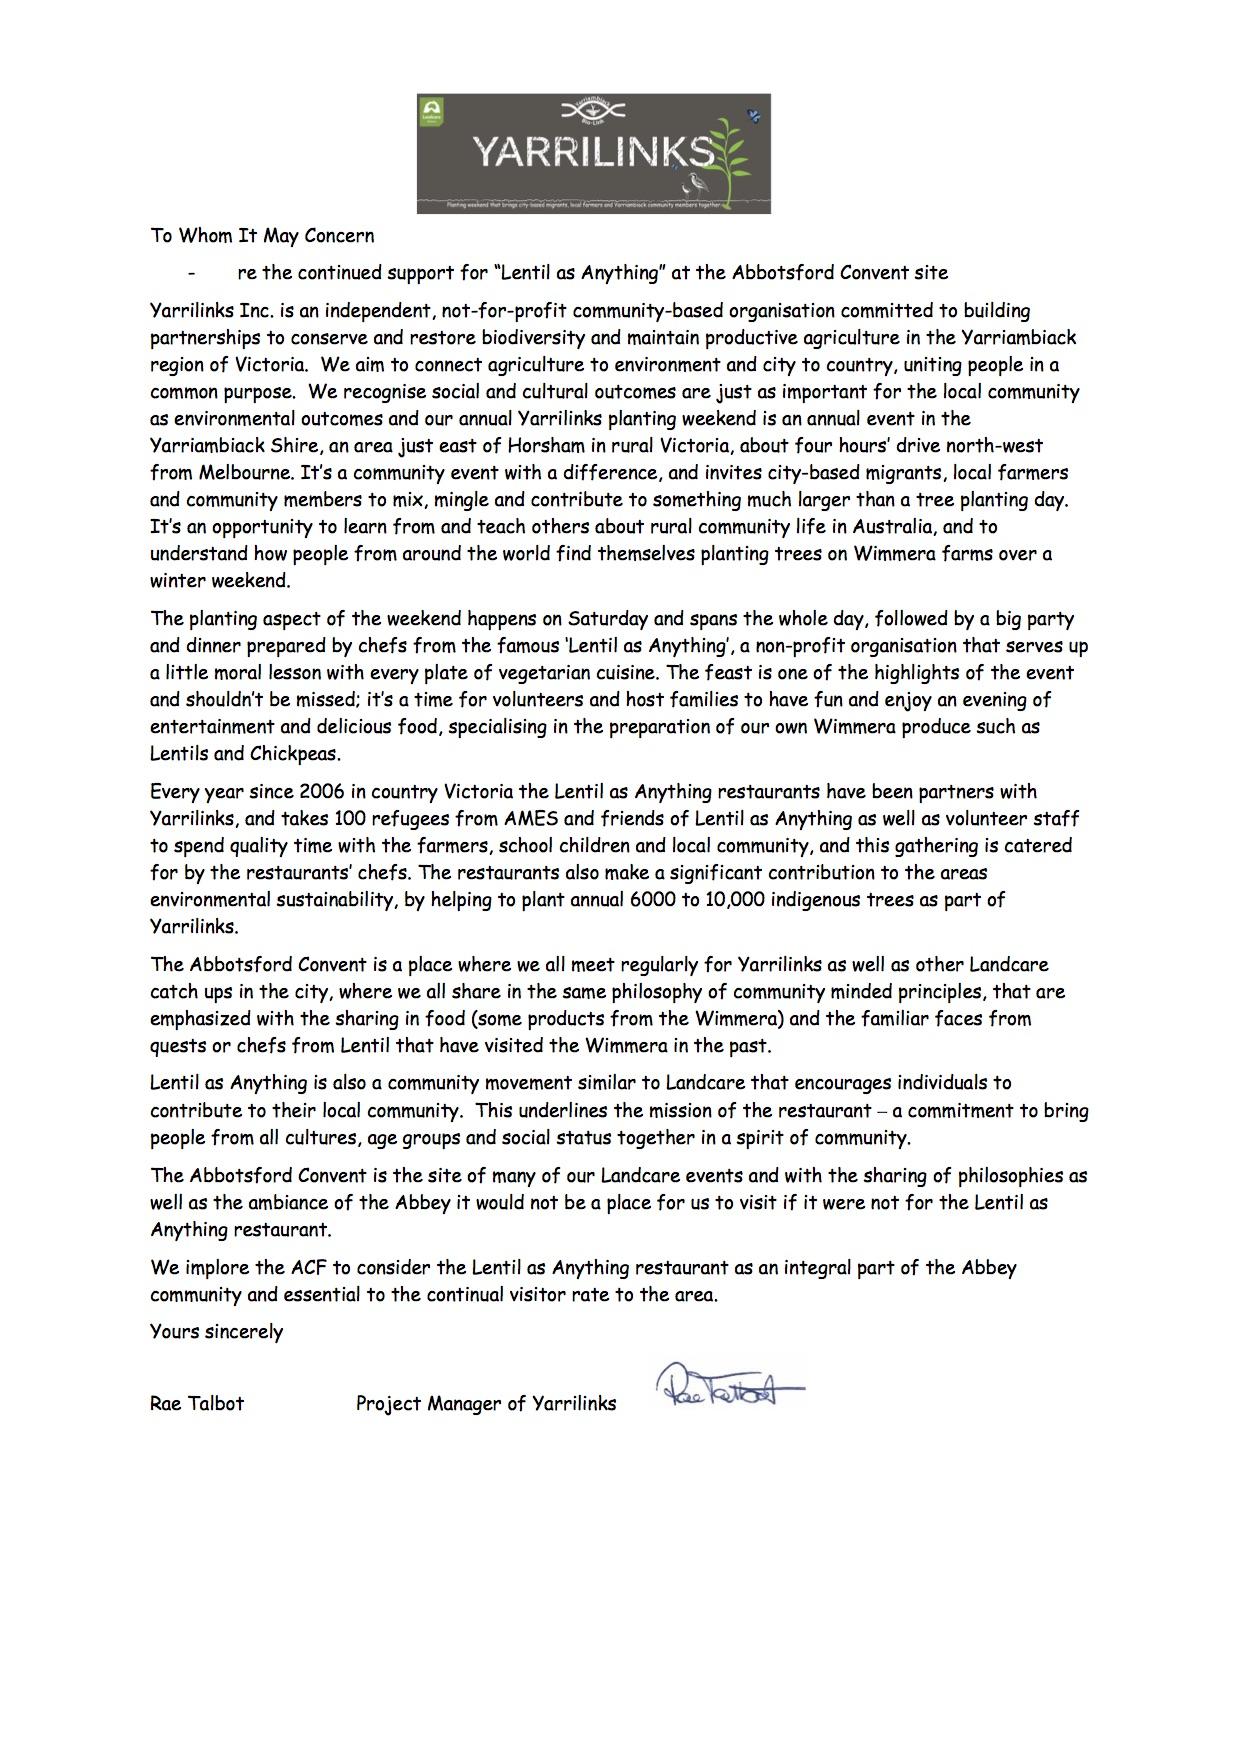 Yarrilinks  LaA letter of support